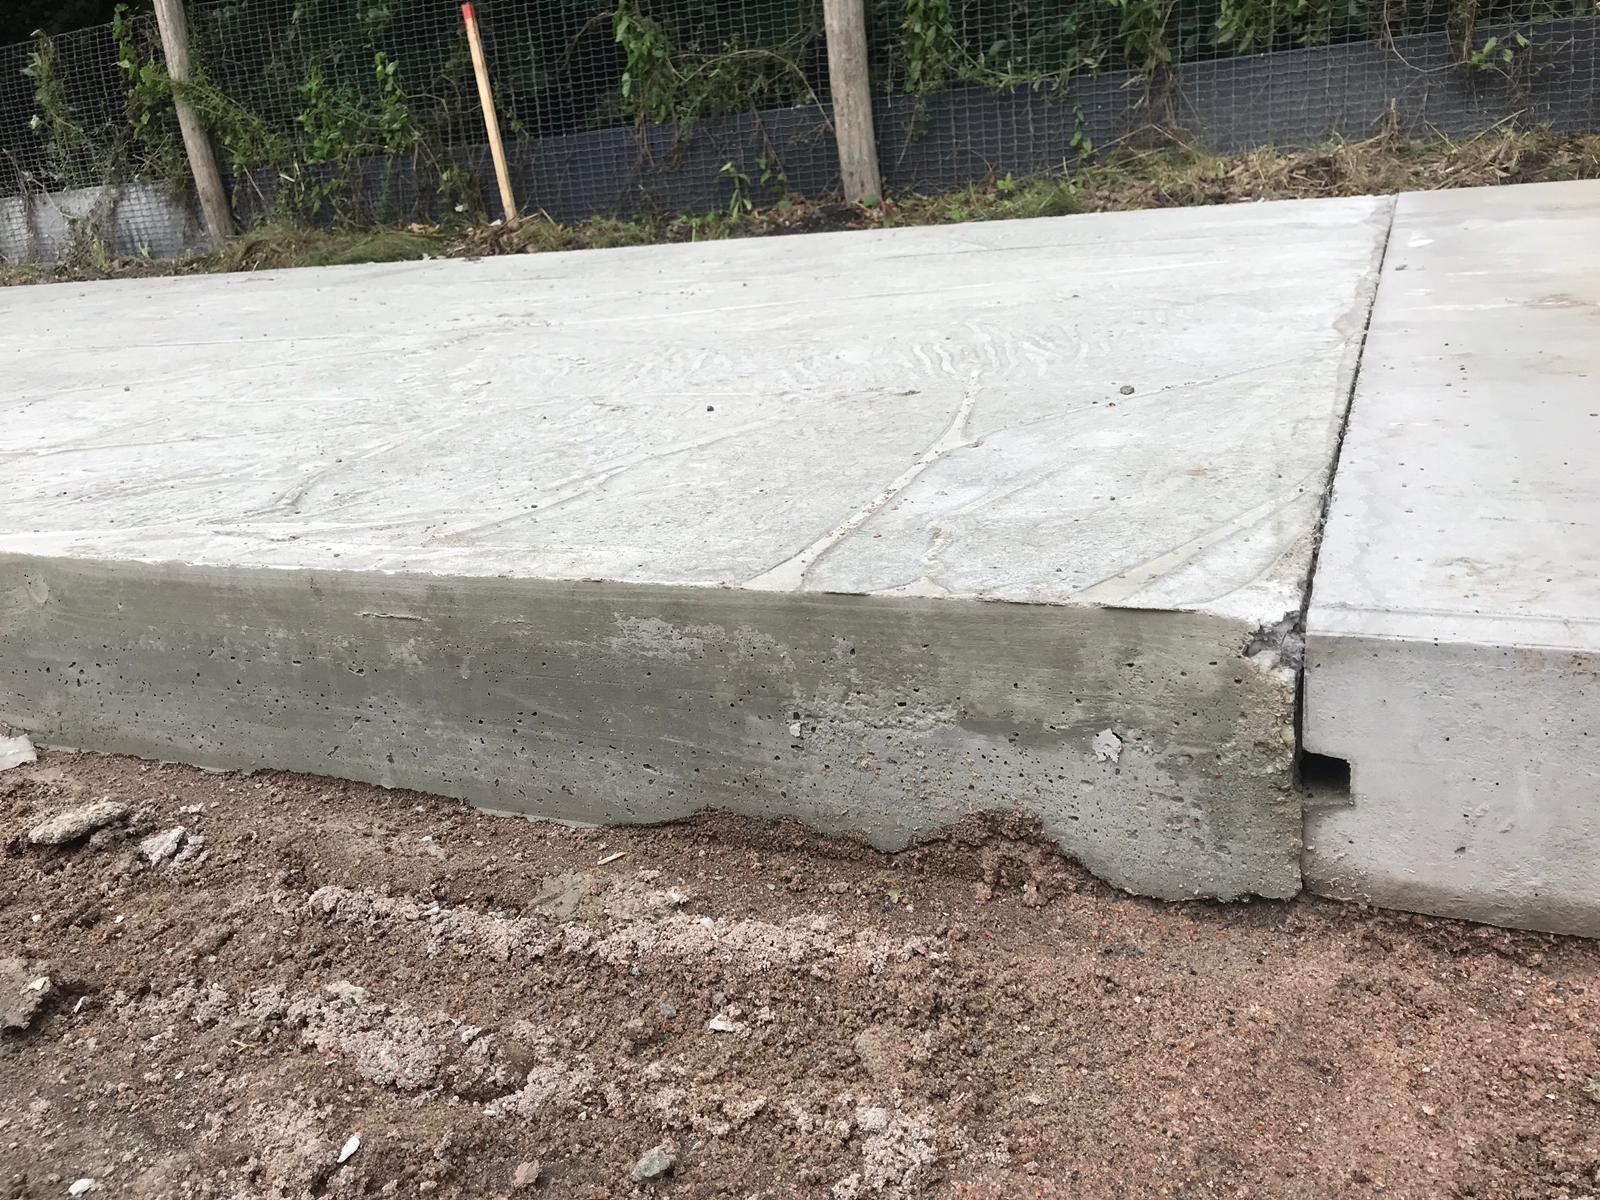 aansluiting-prefab-gekoppelde-fietspadplaten-op-stortbeton-beiden-circulair-en-biobased-beton